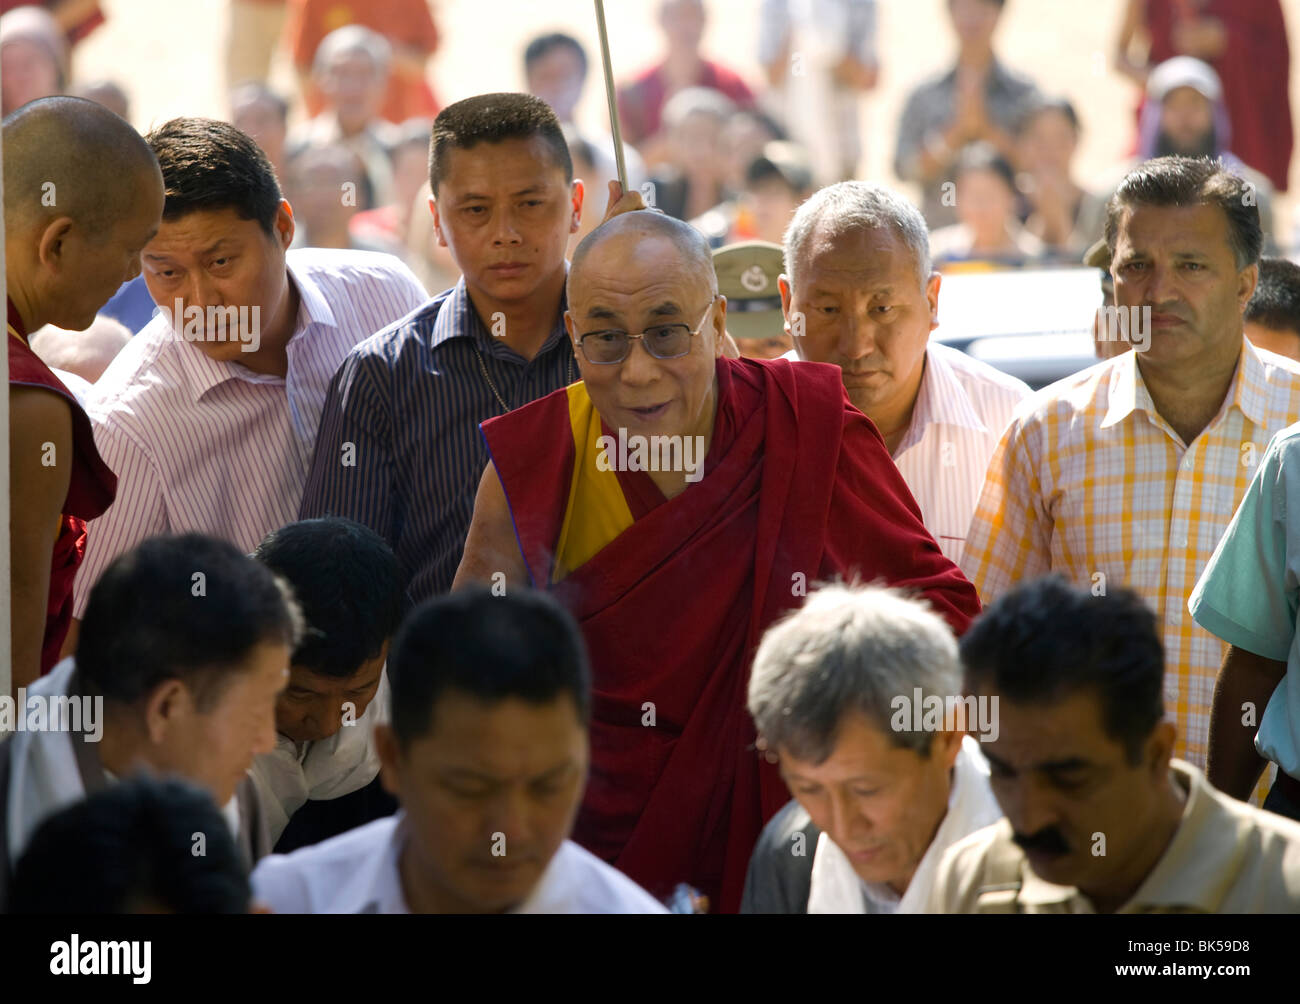 His Holiness the 14th Dalai Lama arrives at Tibetan Children's Village Dharamsala, India campus - Stock Image